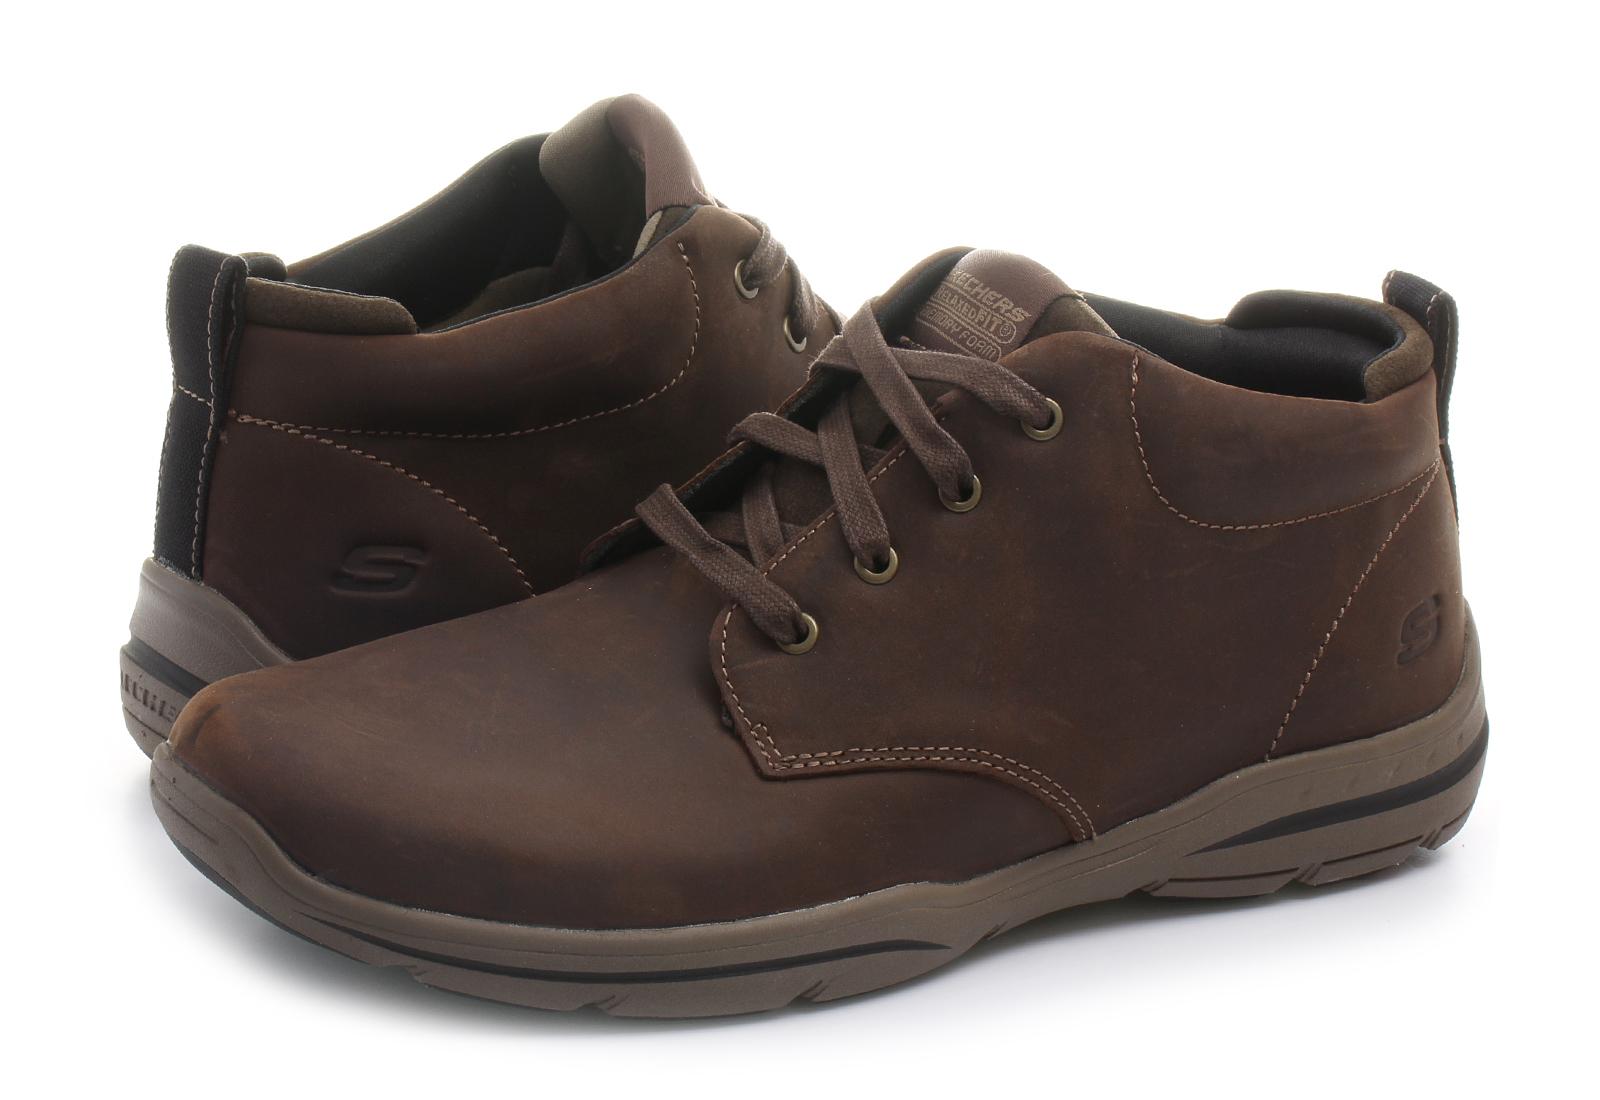 Limpiar el piso arpón Endulzar  Office Shoes dyqani online